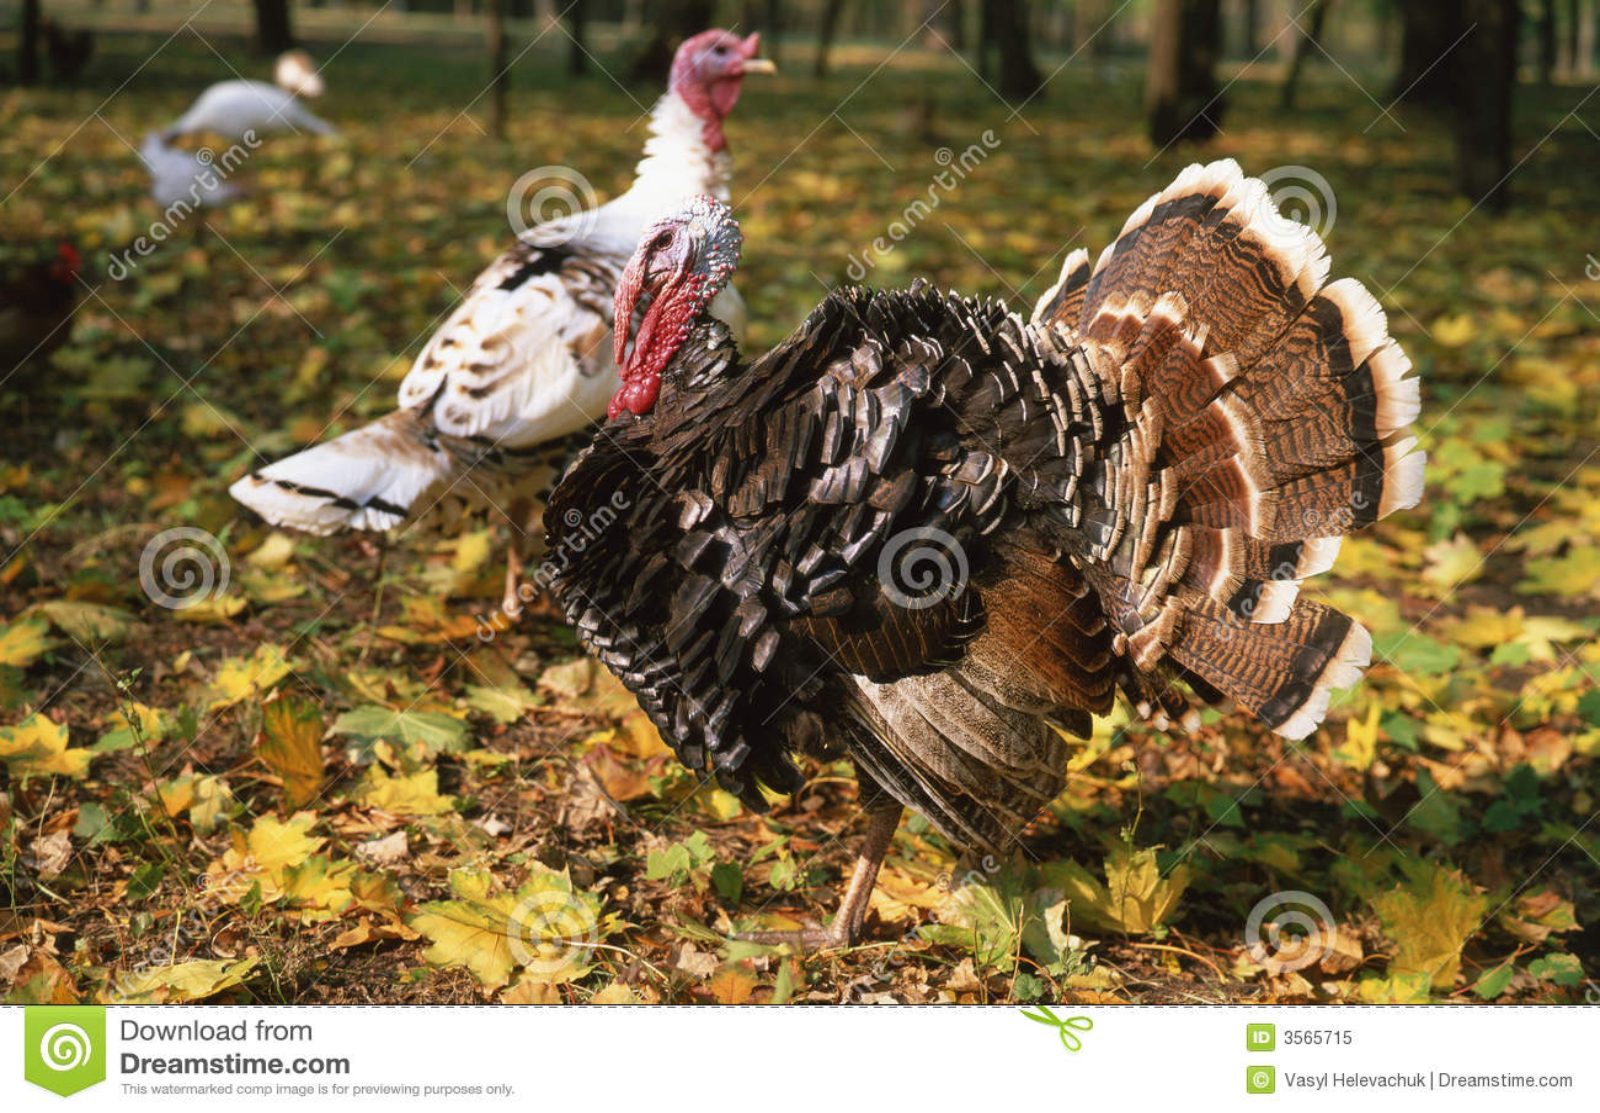 Turkey-cock,